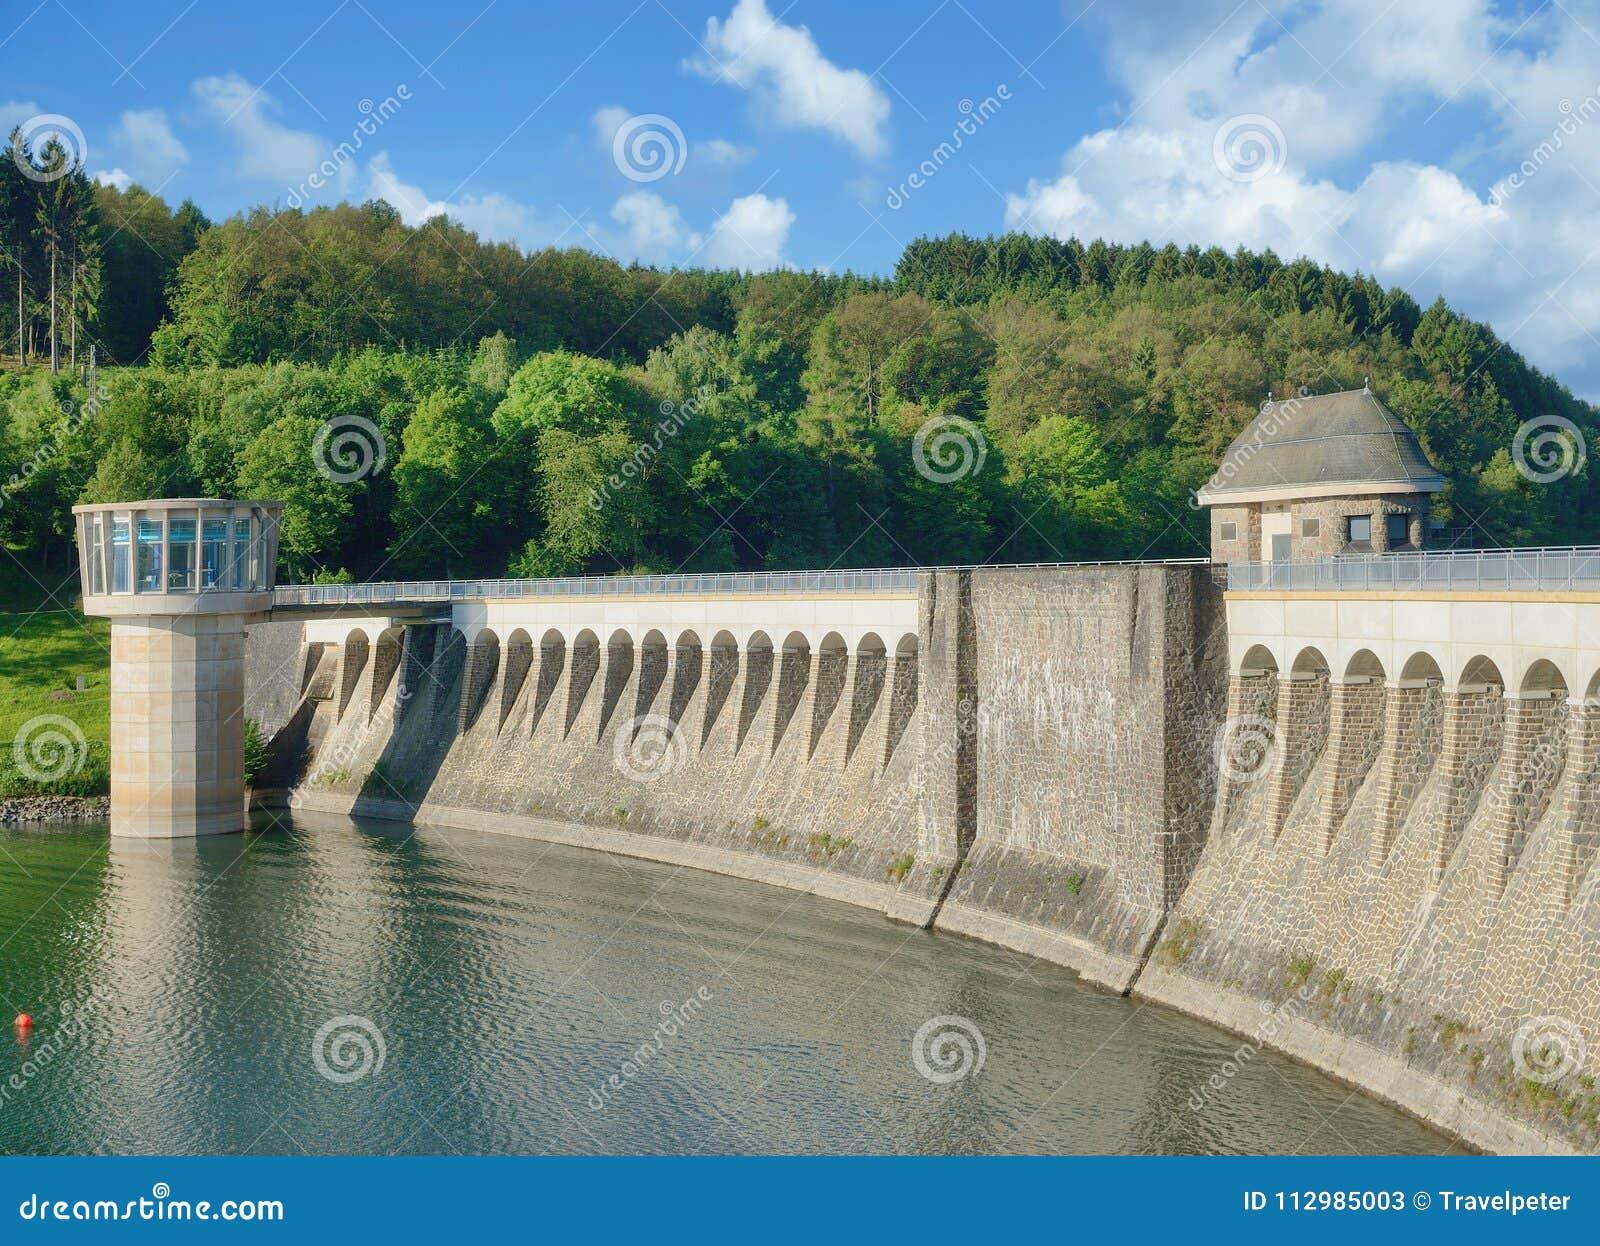 Listertalsperre Reservoir,Sauerland,Germany